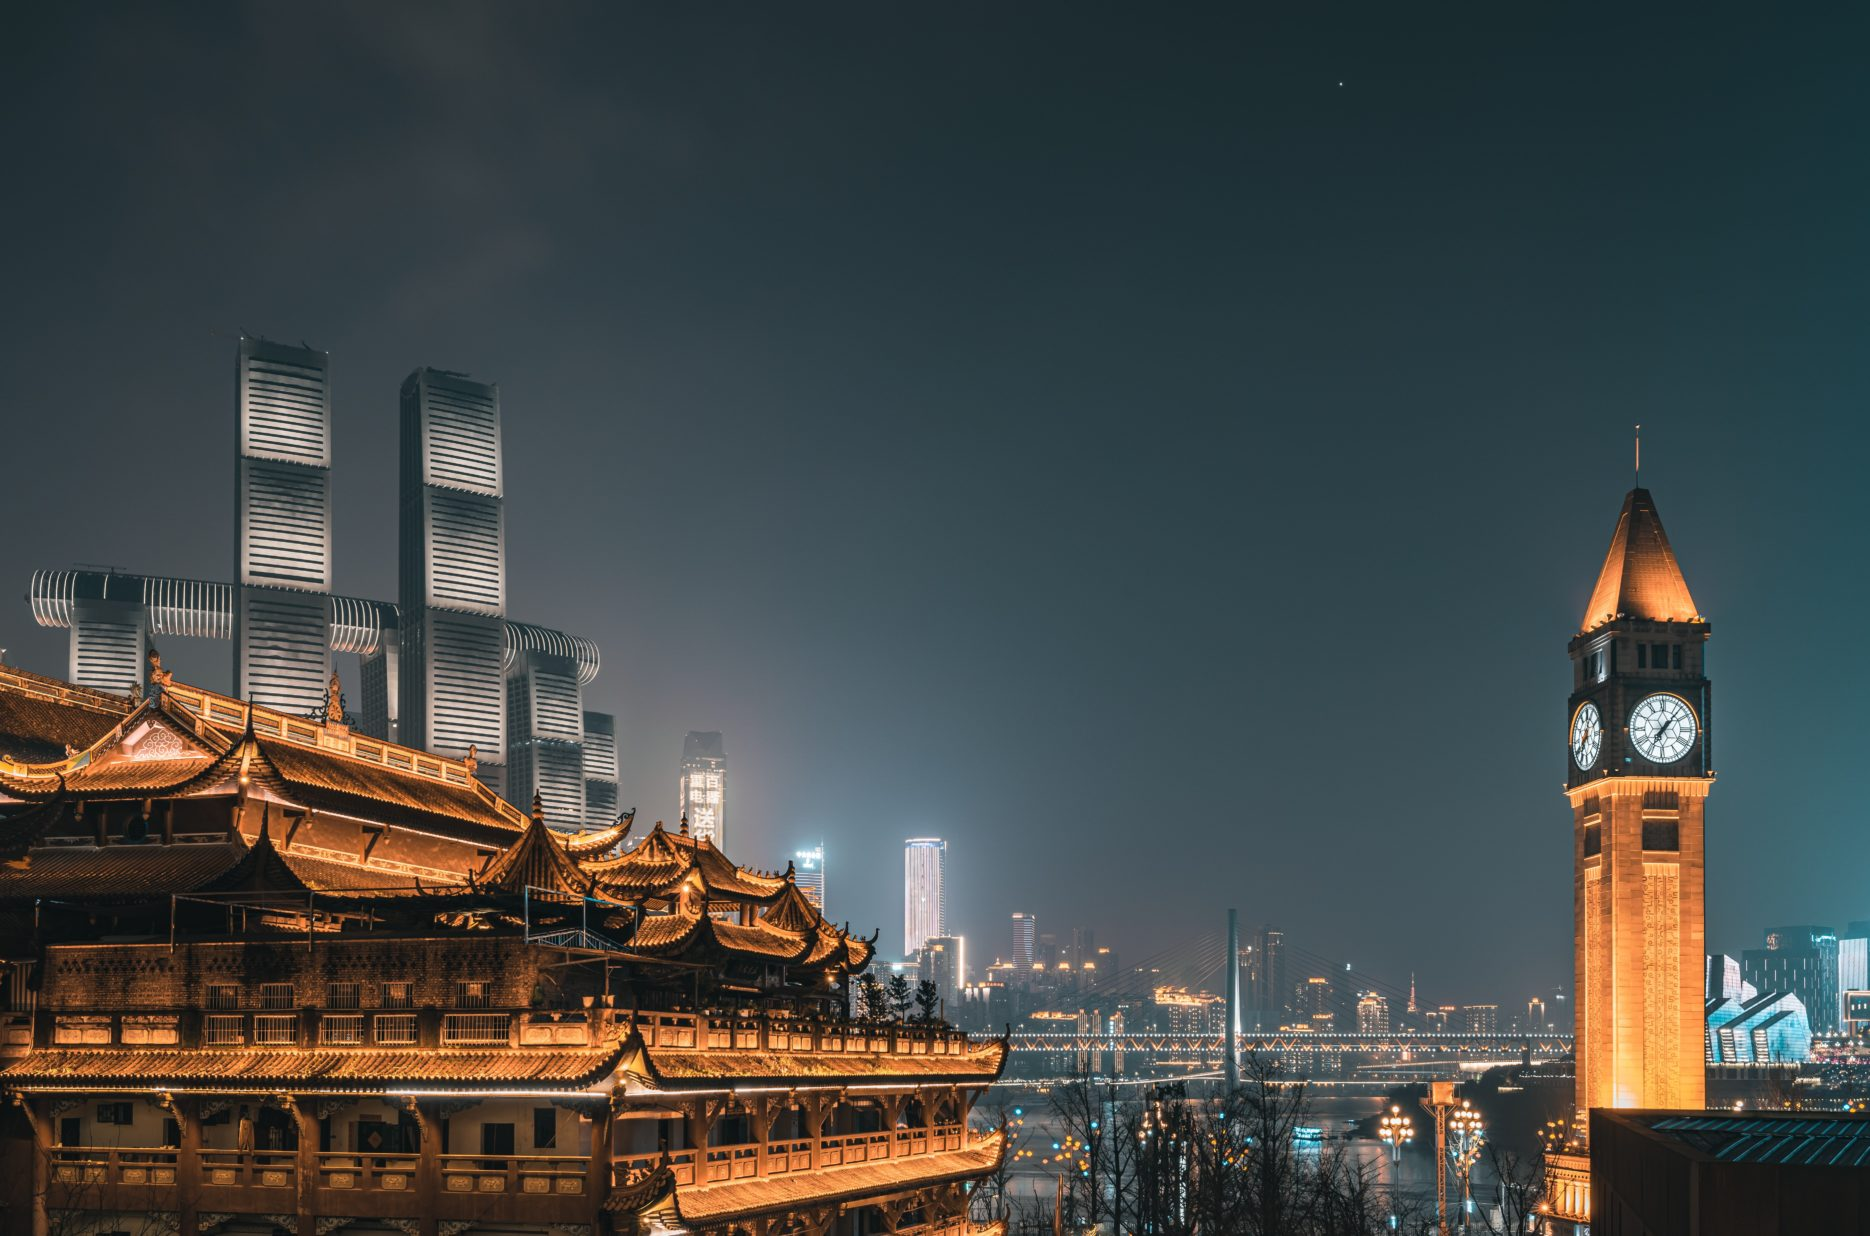 Chongqing. Credit: Unsplash